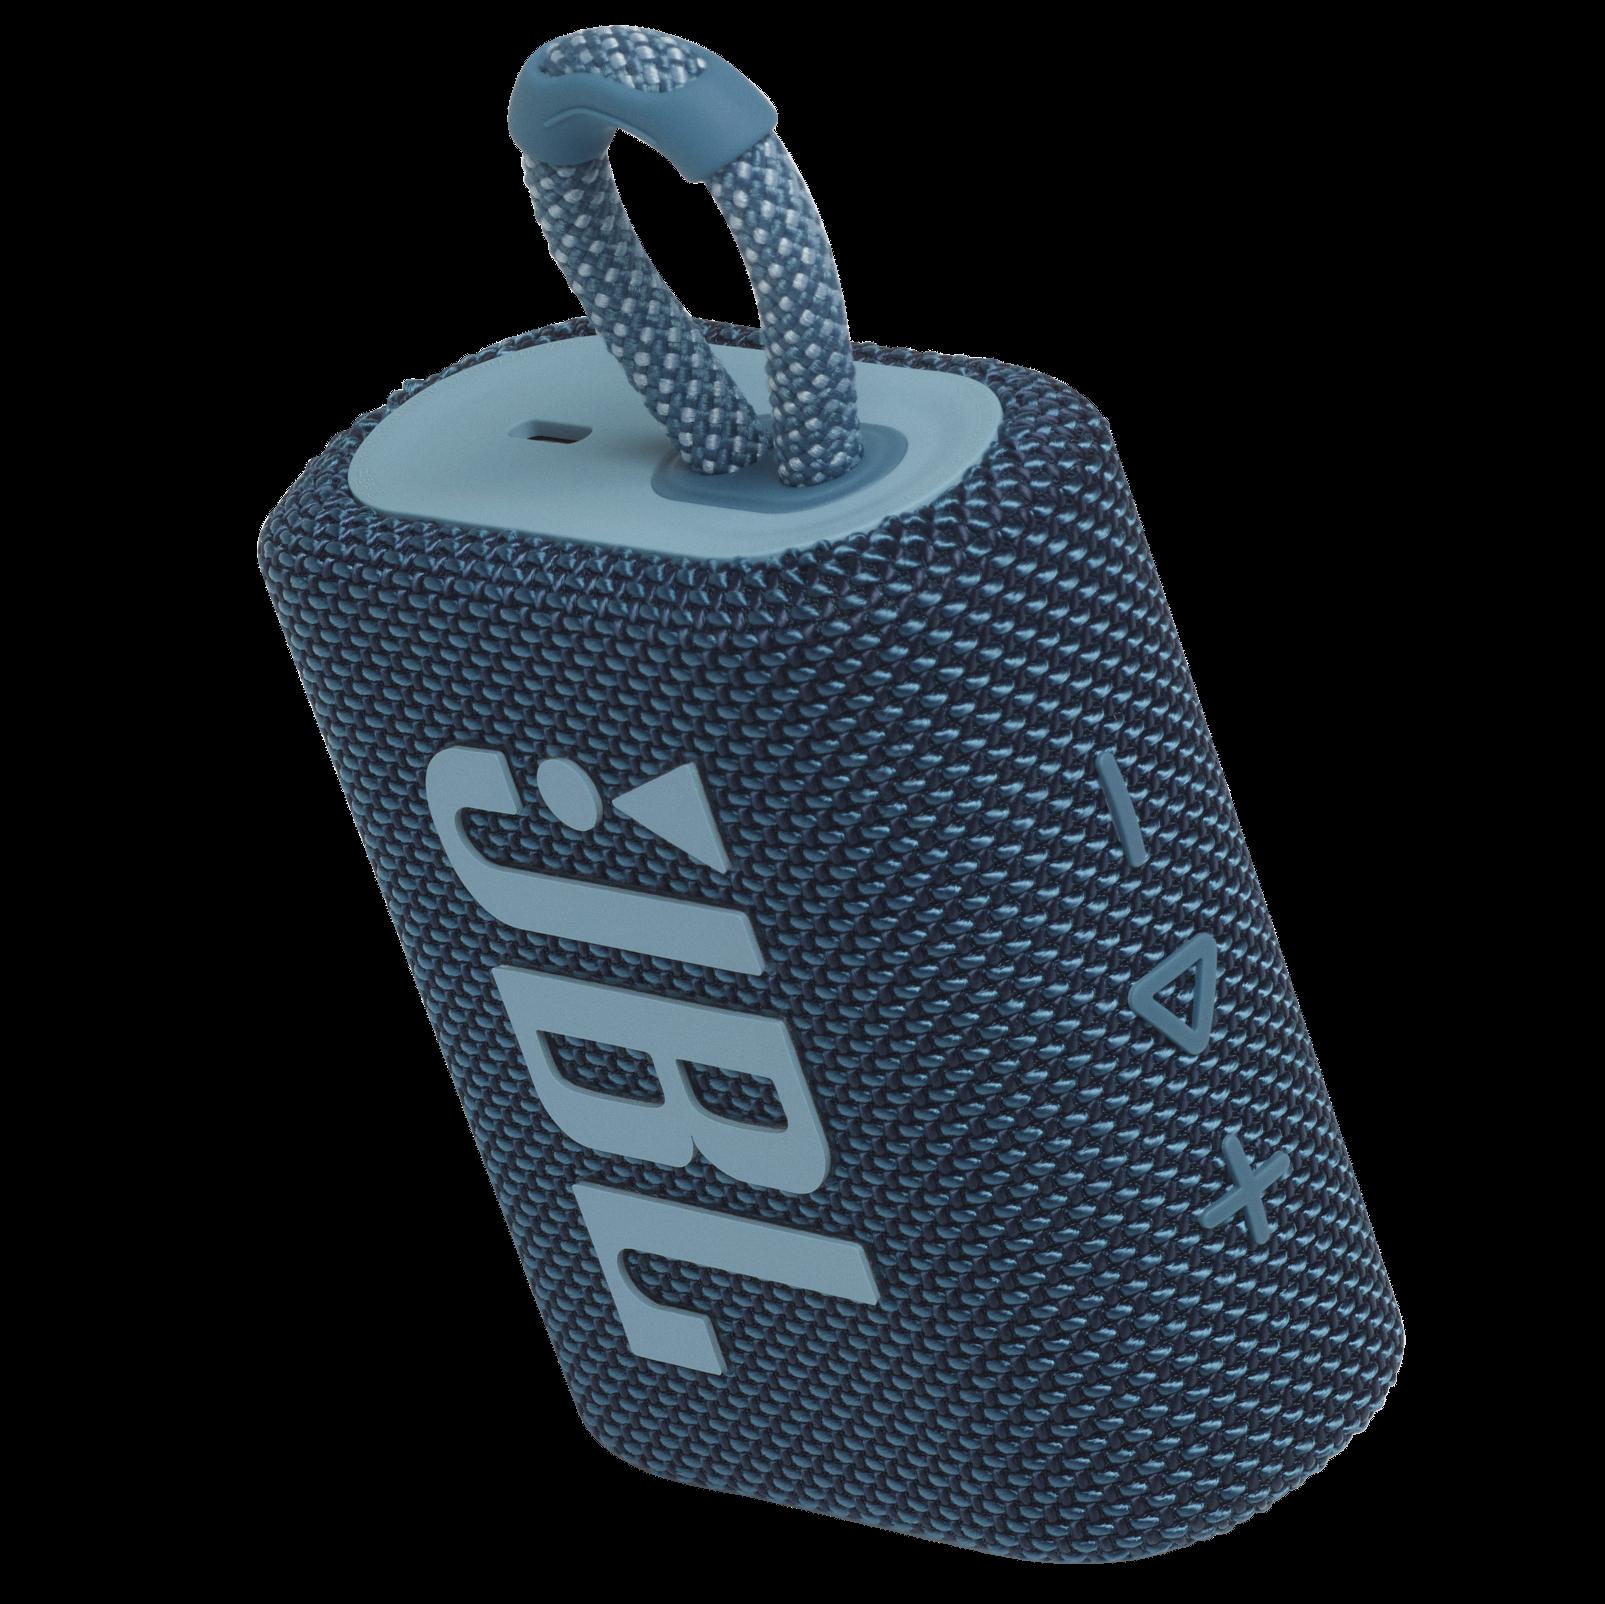 JBL Go 3 - Blue - Portable Waterproof Speaker - Detailshot 2